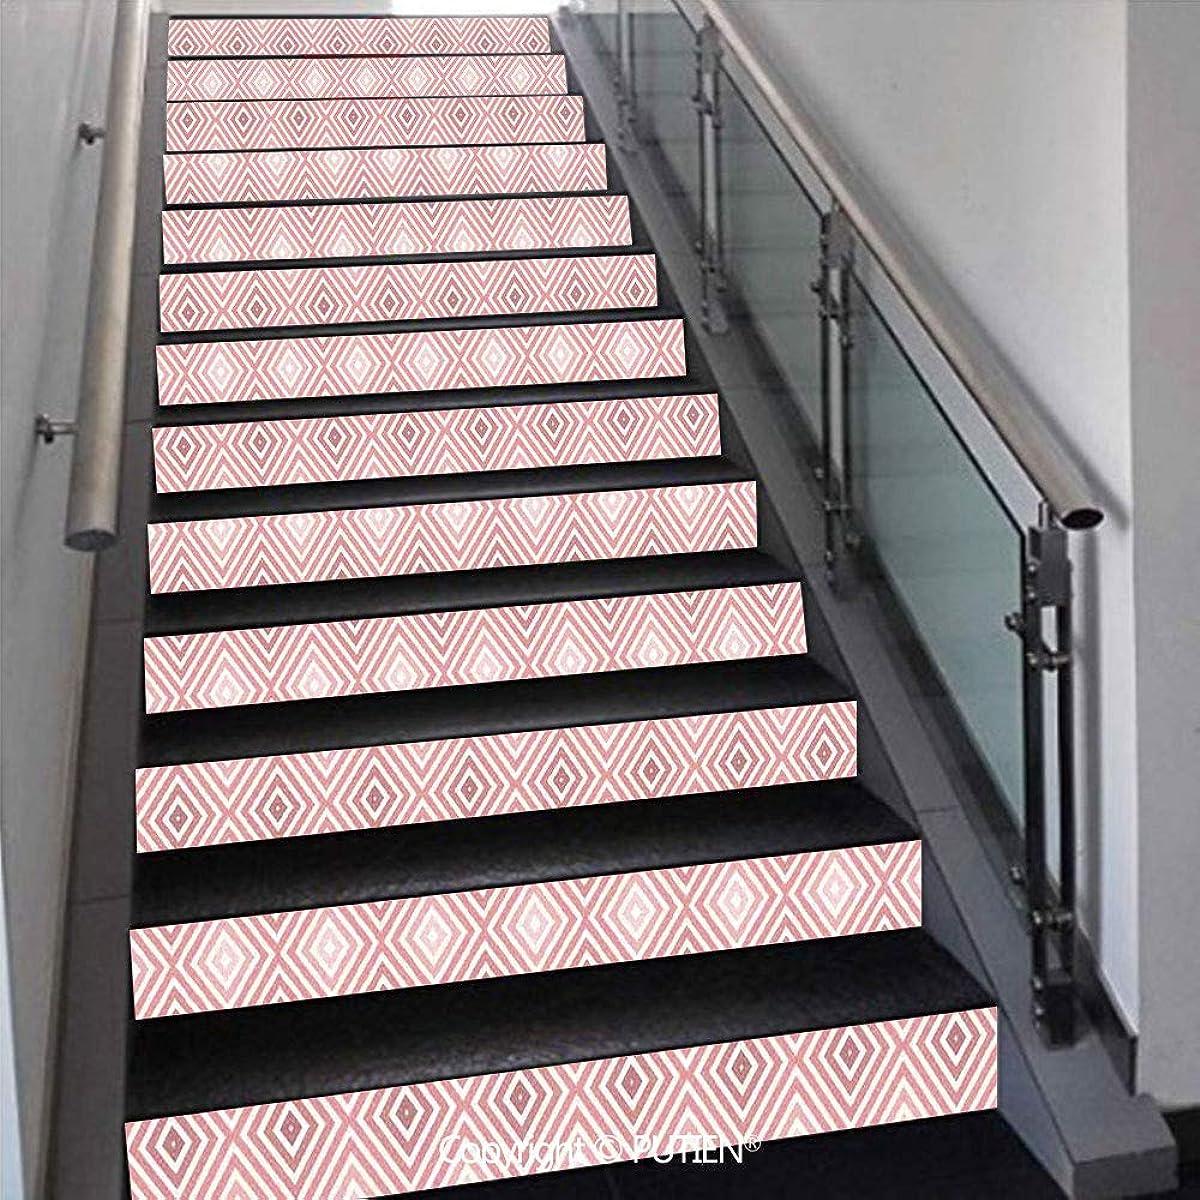 PUTIEN European Stair Stickers Wall Stickers,13 PCS Self-Adhesive [ Geometric Decor,Diamond Shaped Enlargin